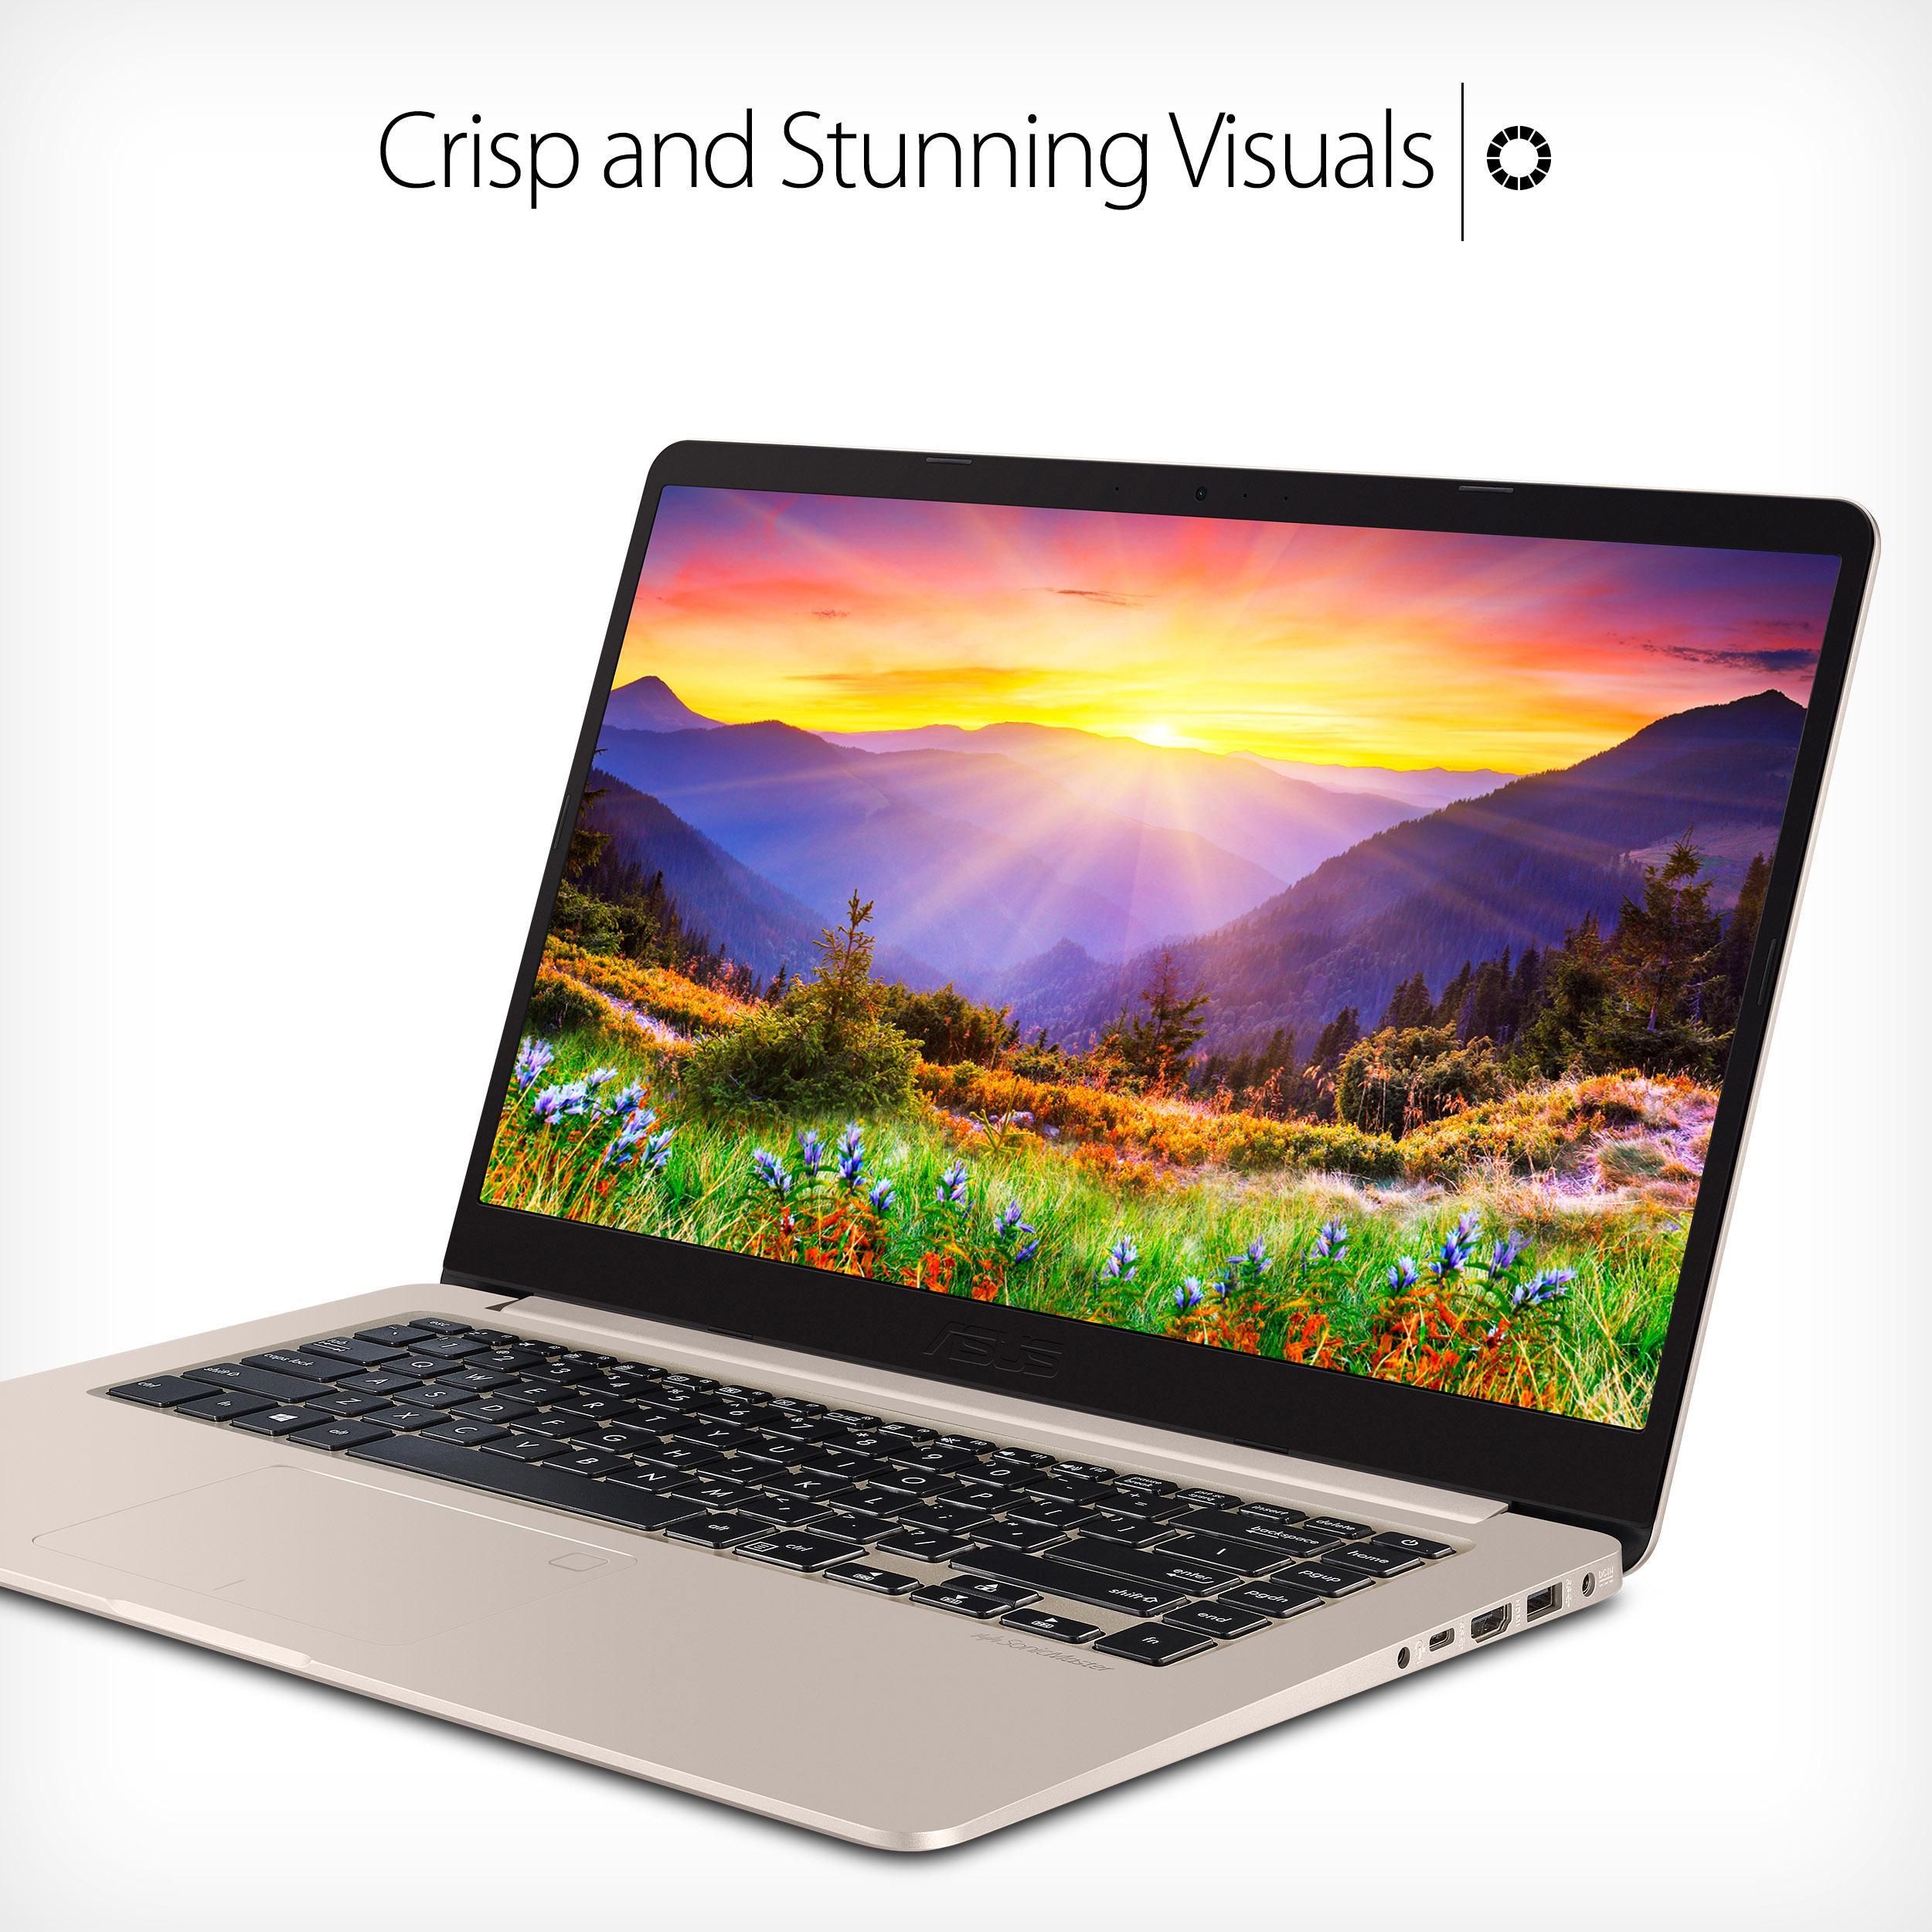 Asus Vivobook S15 S510ur I7 8550u 18ghz 12gb Ram 1tb 156 Full Frame Keybord Laptop X 455 Casing View Larger